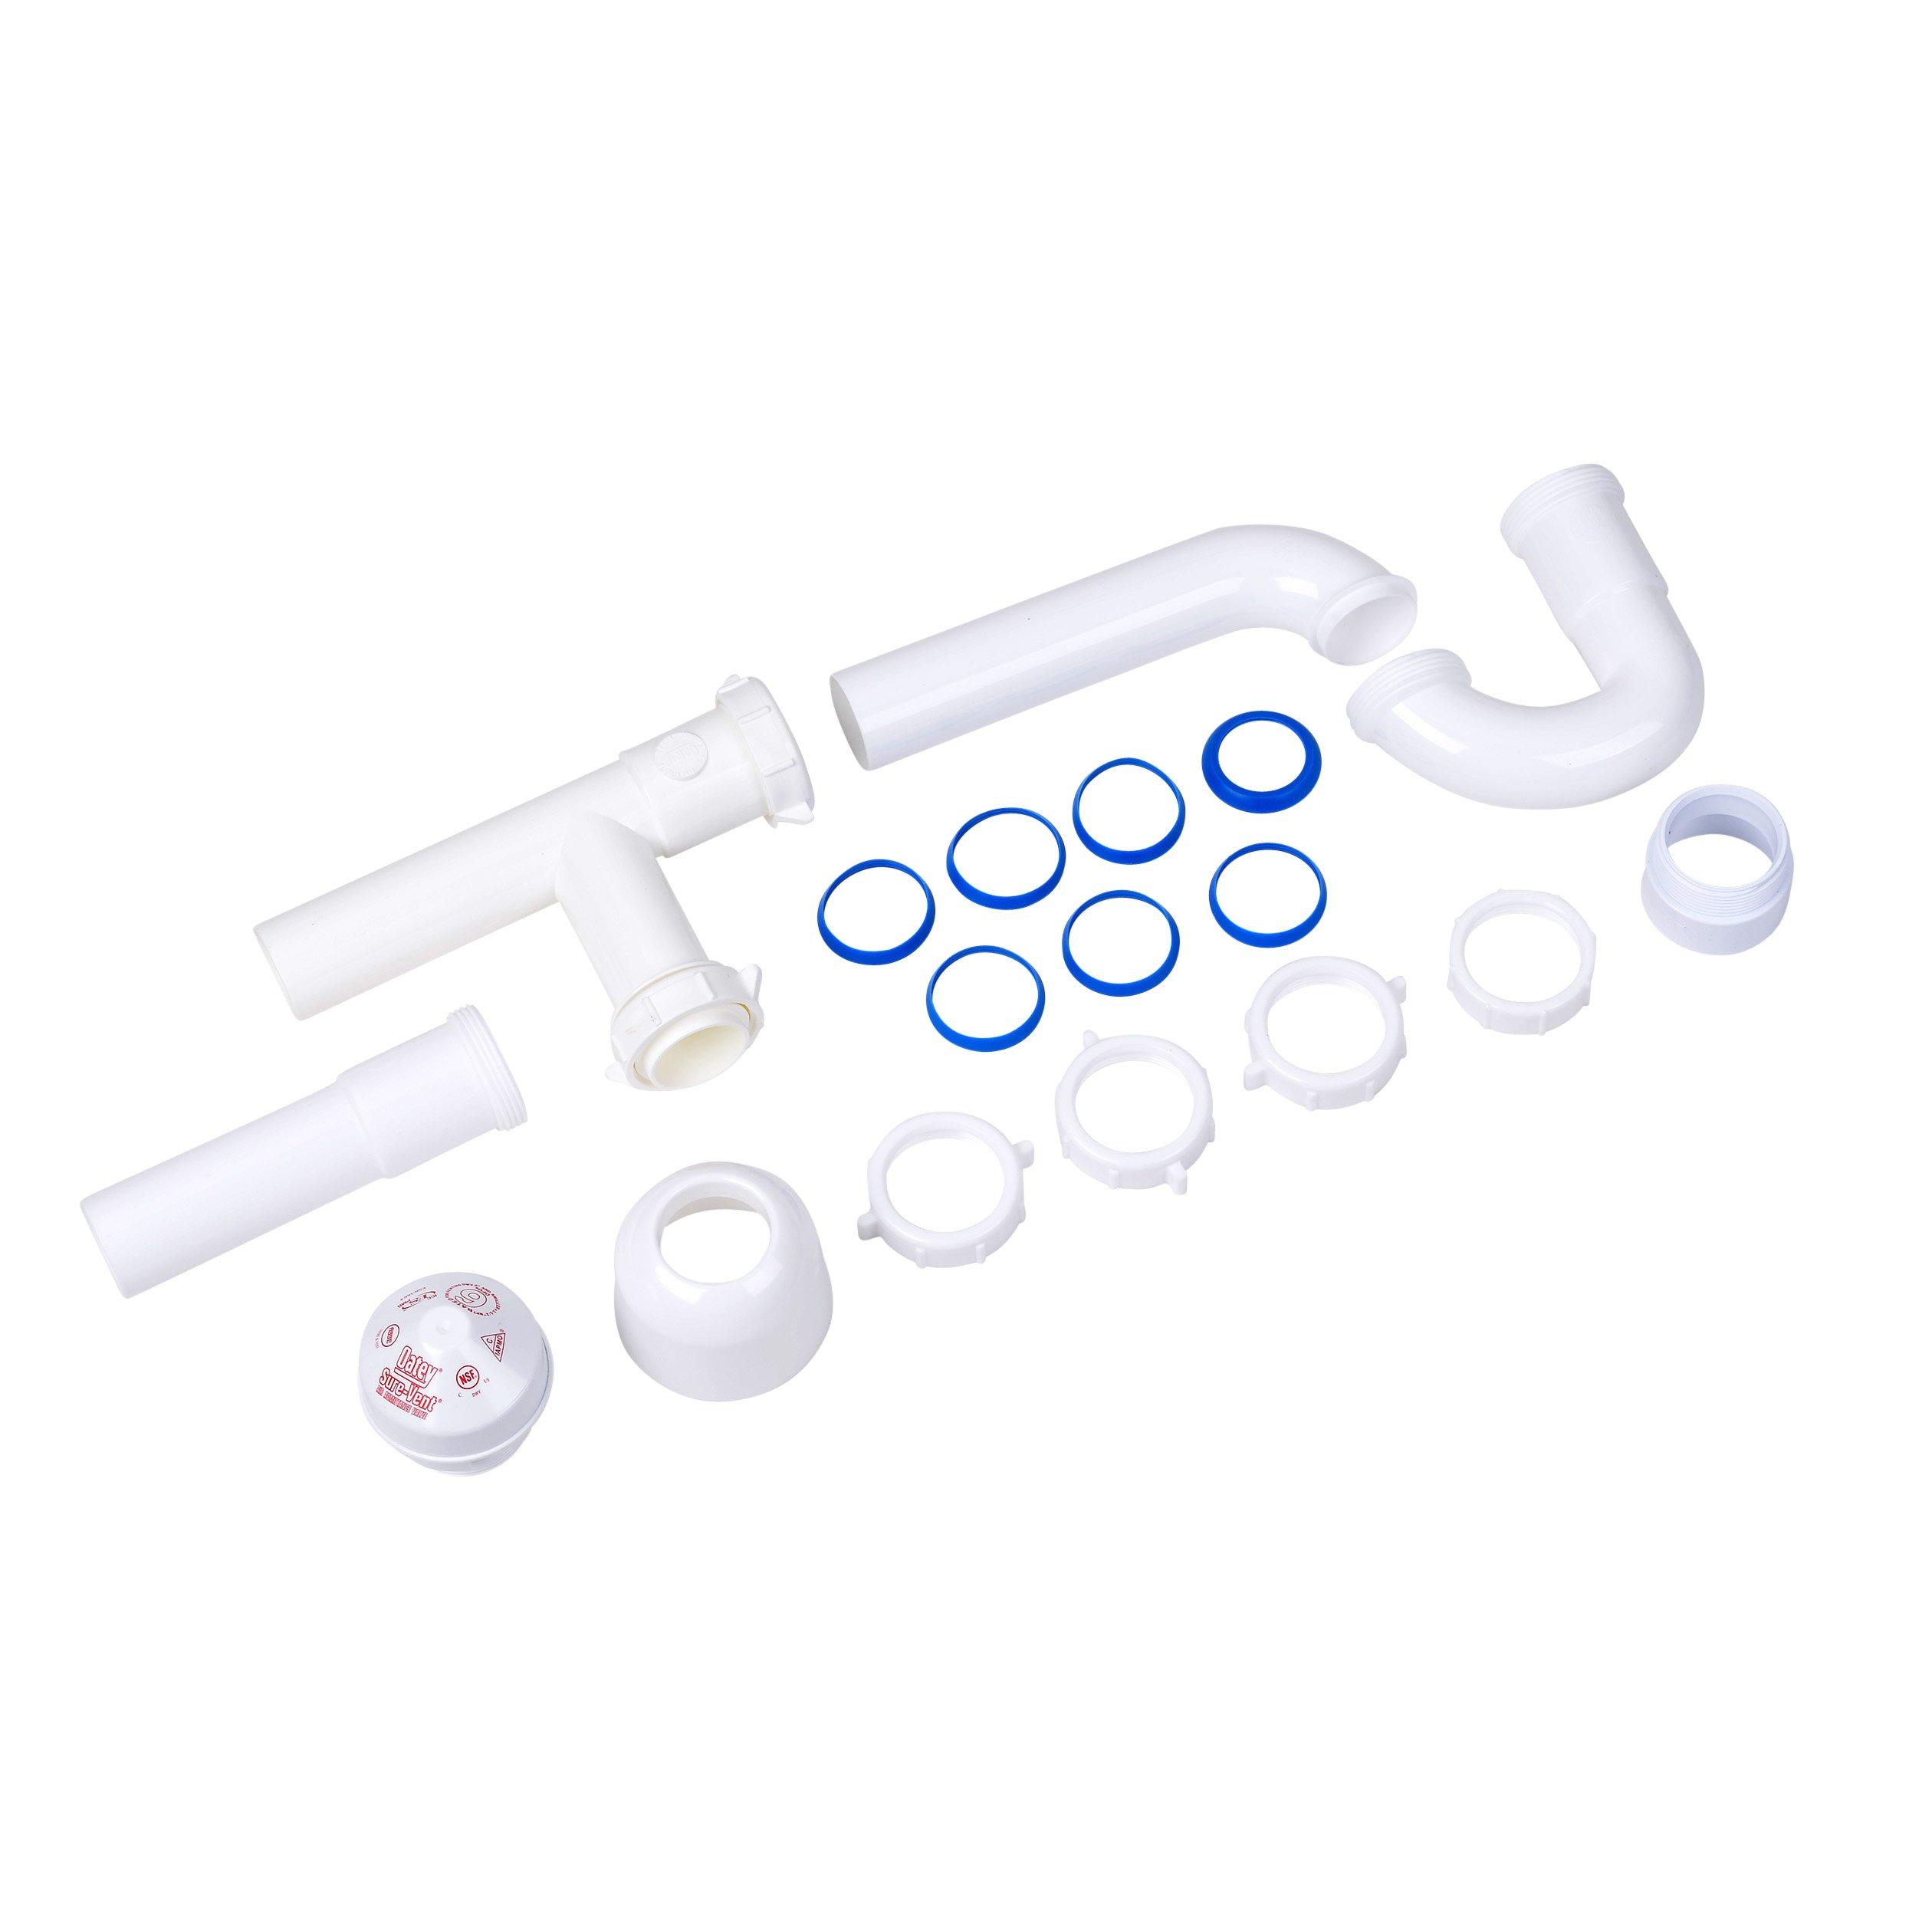 "Oatey 39239 1.5"" 6 DFU AAV Installation Kit 1-1/2"" P-trap, 6"" extension tube, PVC threaded adapter & deep box flange"